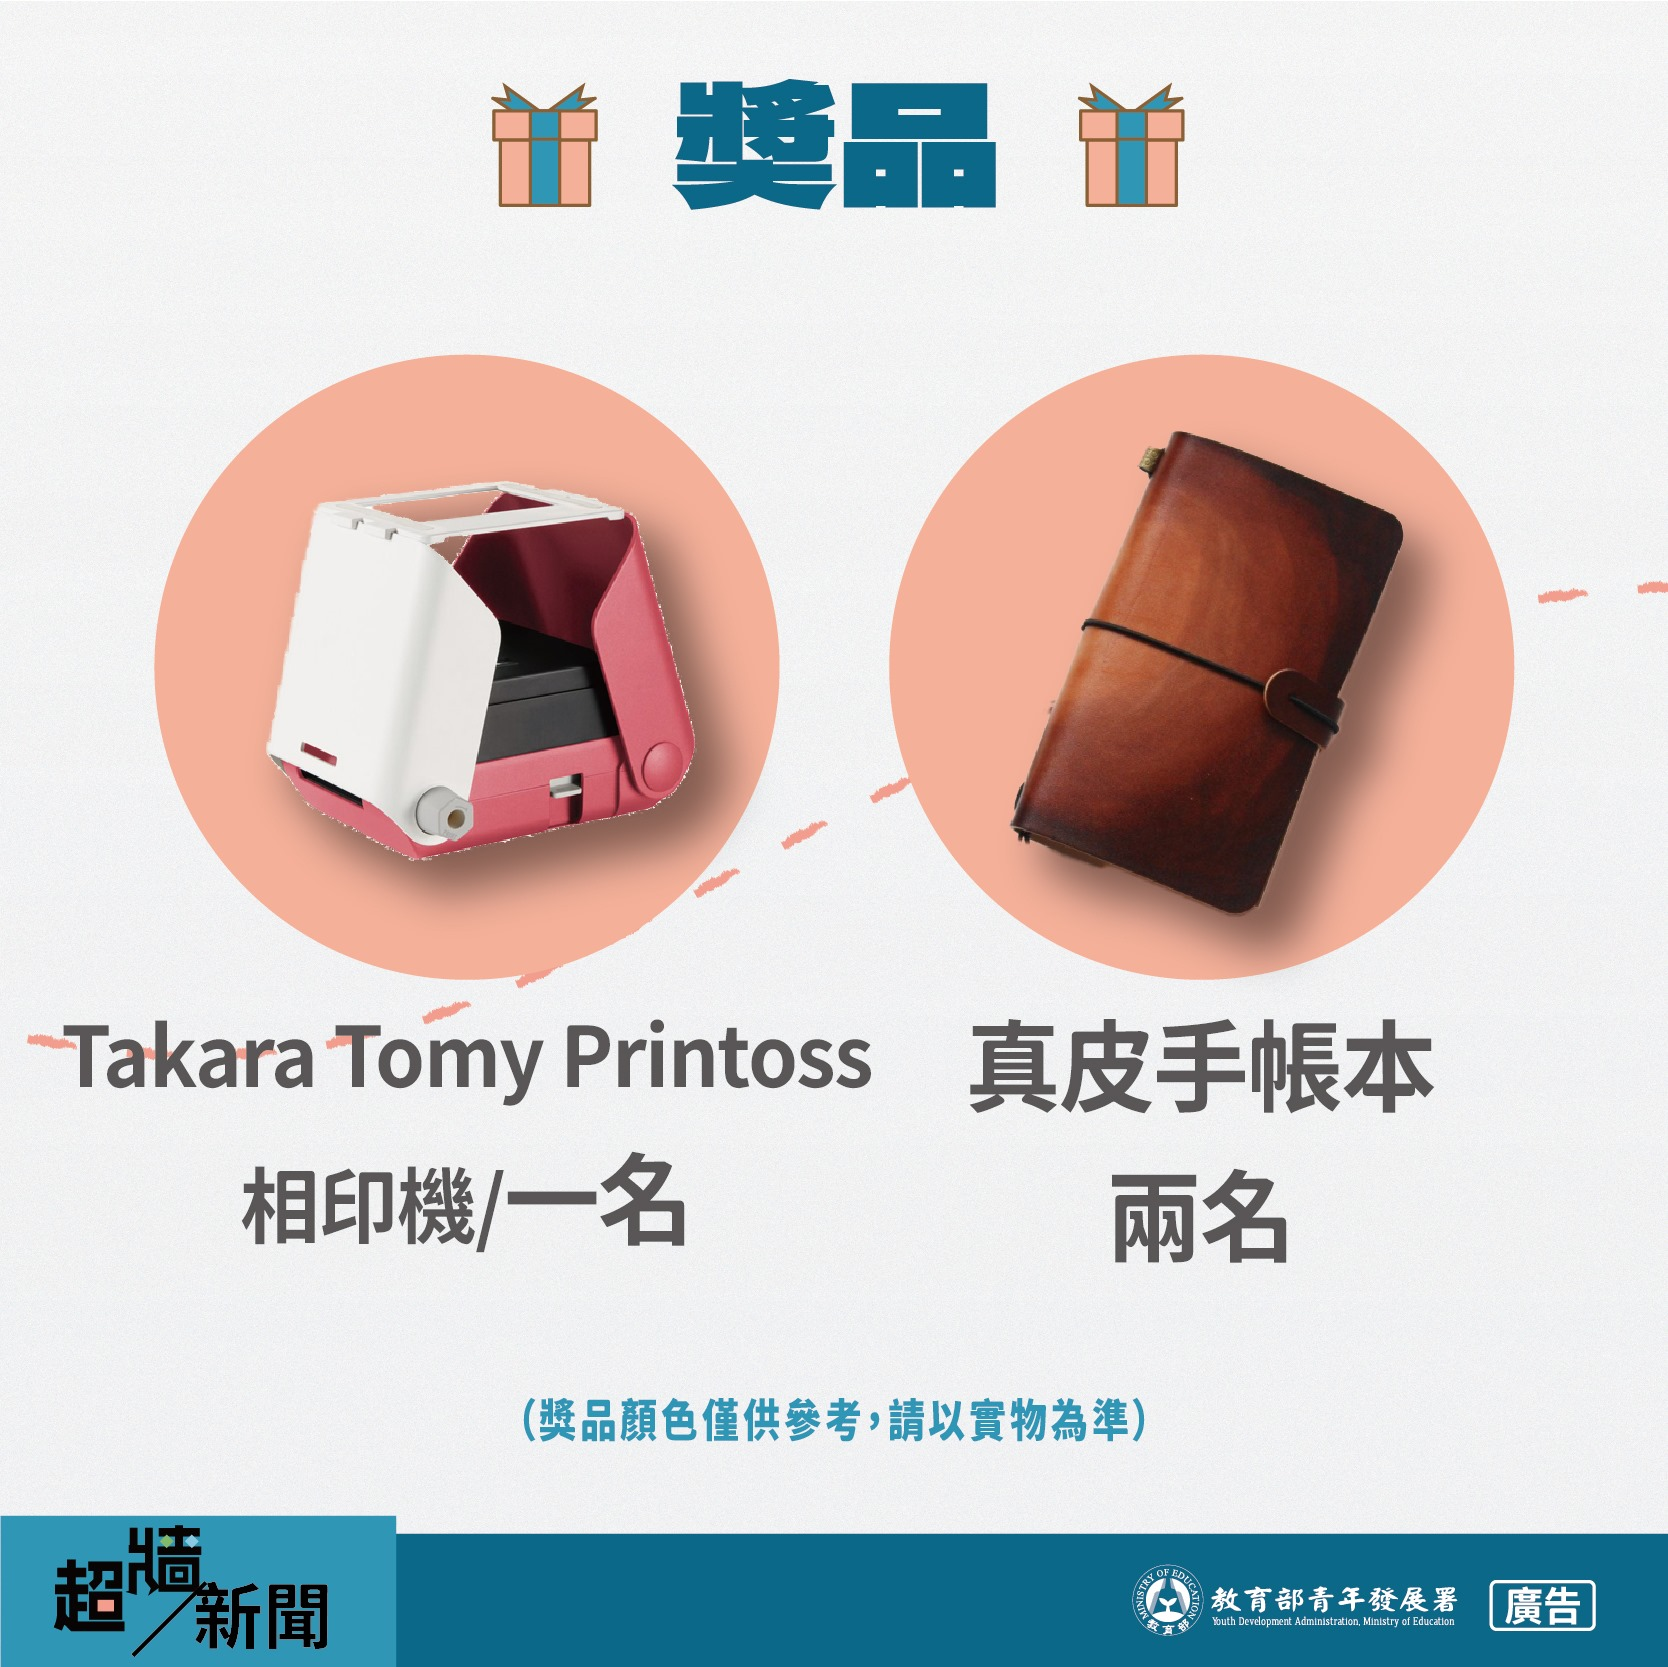 獎品: Takara Tomy Printoss 相印機 1名、真皮手帳本 2名。